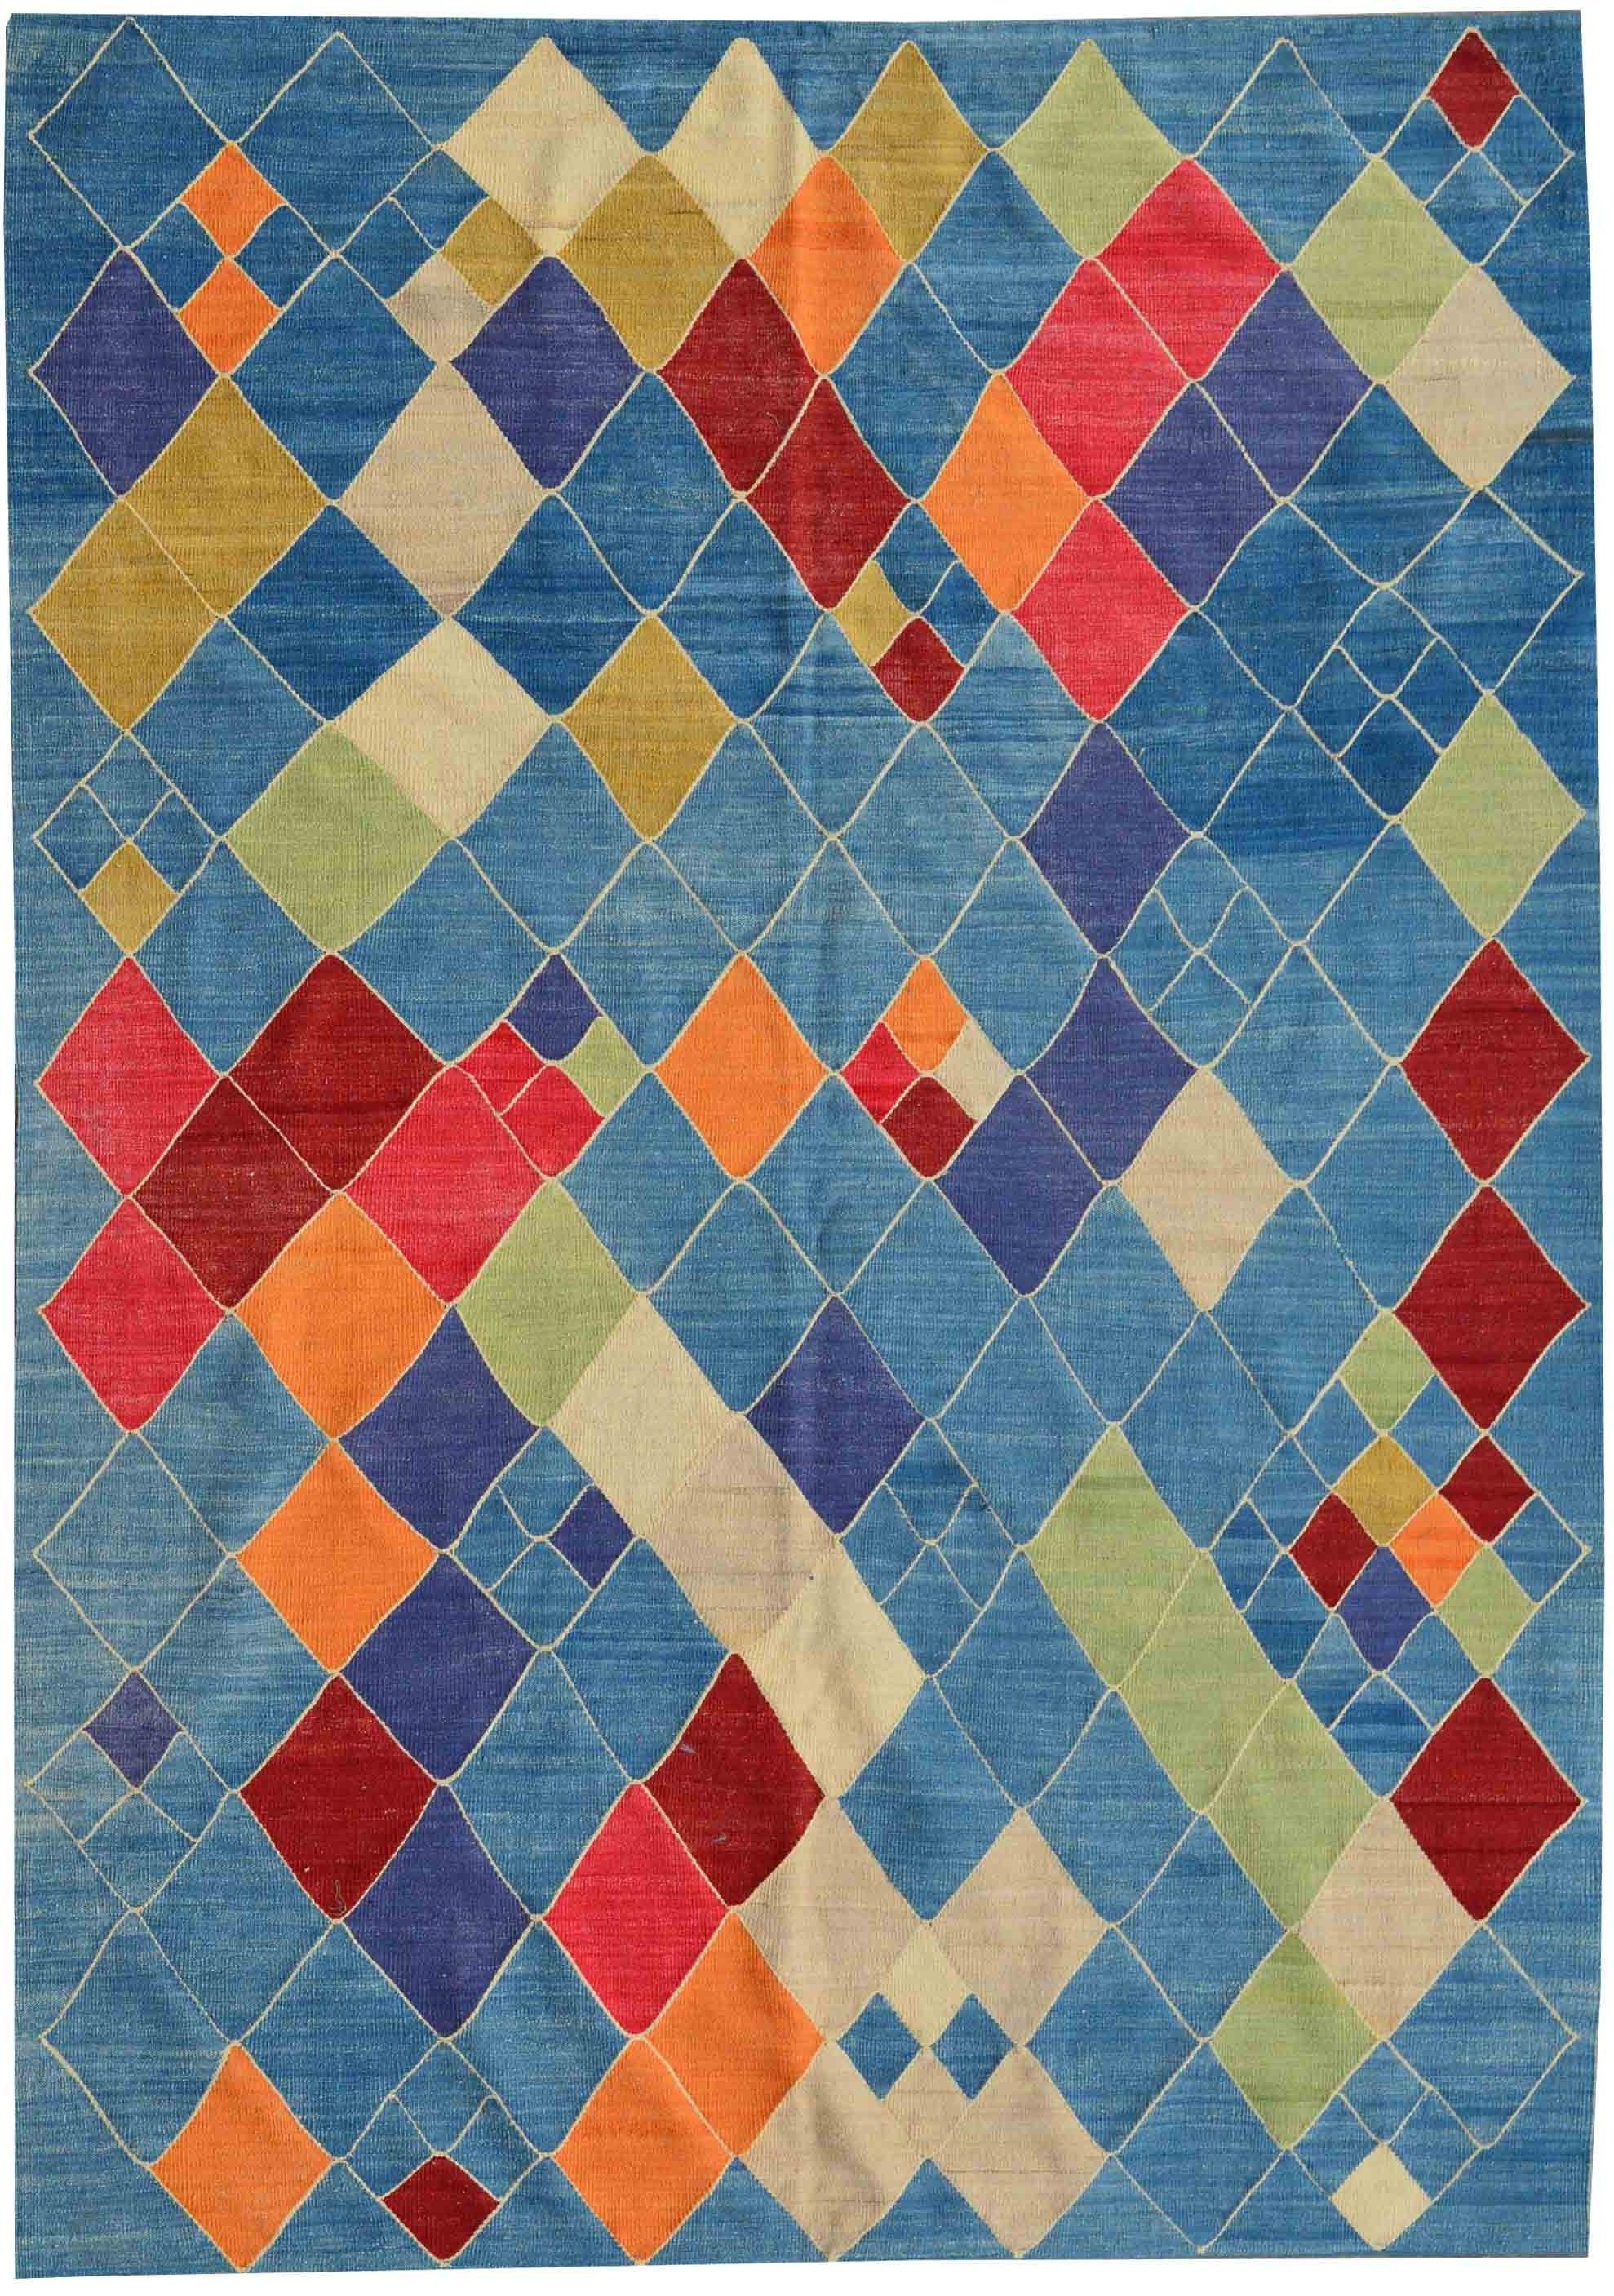 Michel Antoine Tapis & Kilims - Tapis Kilim coloré style arlequin ...